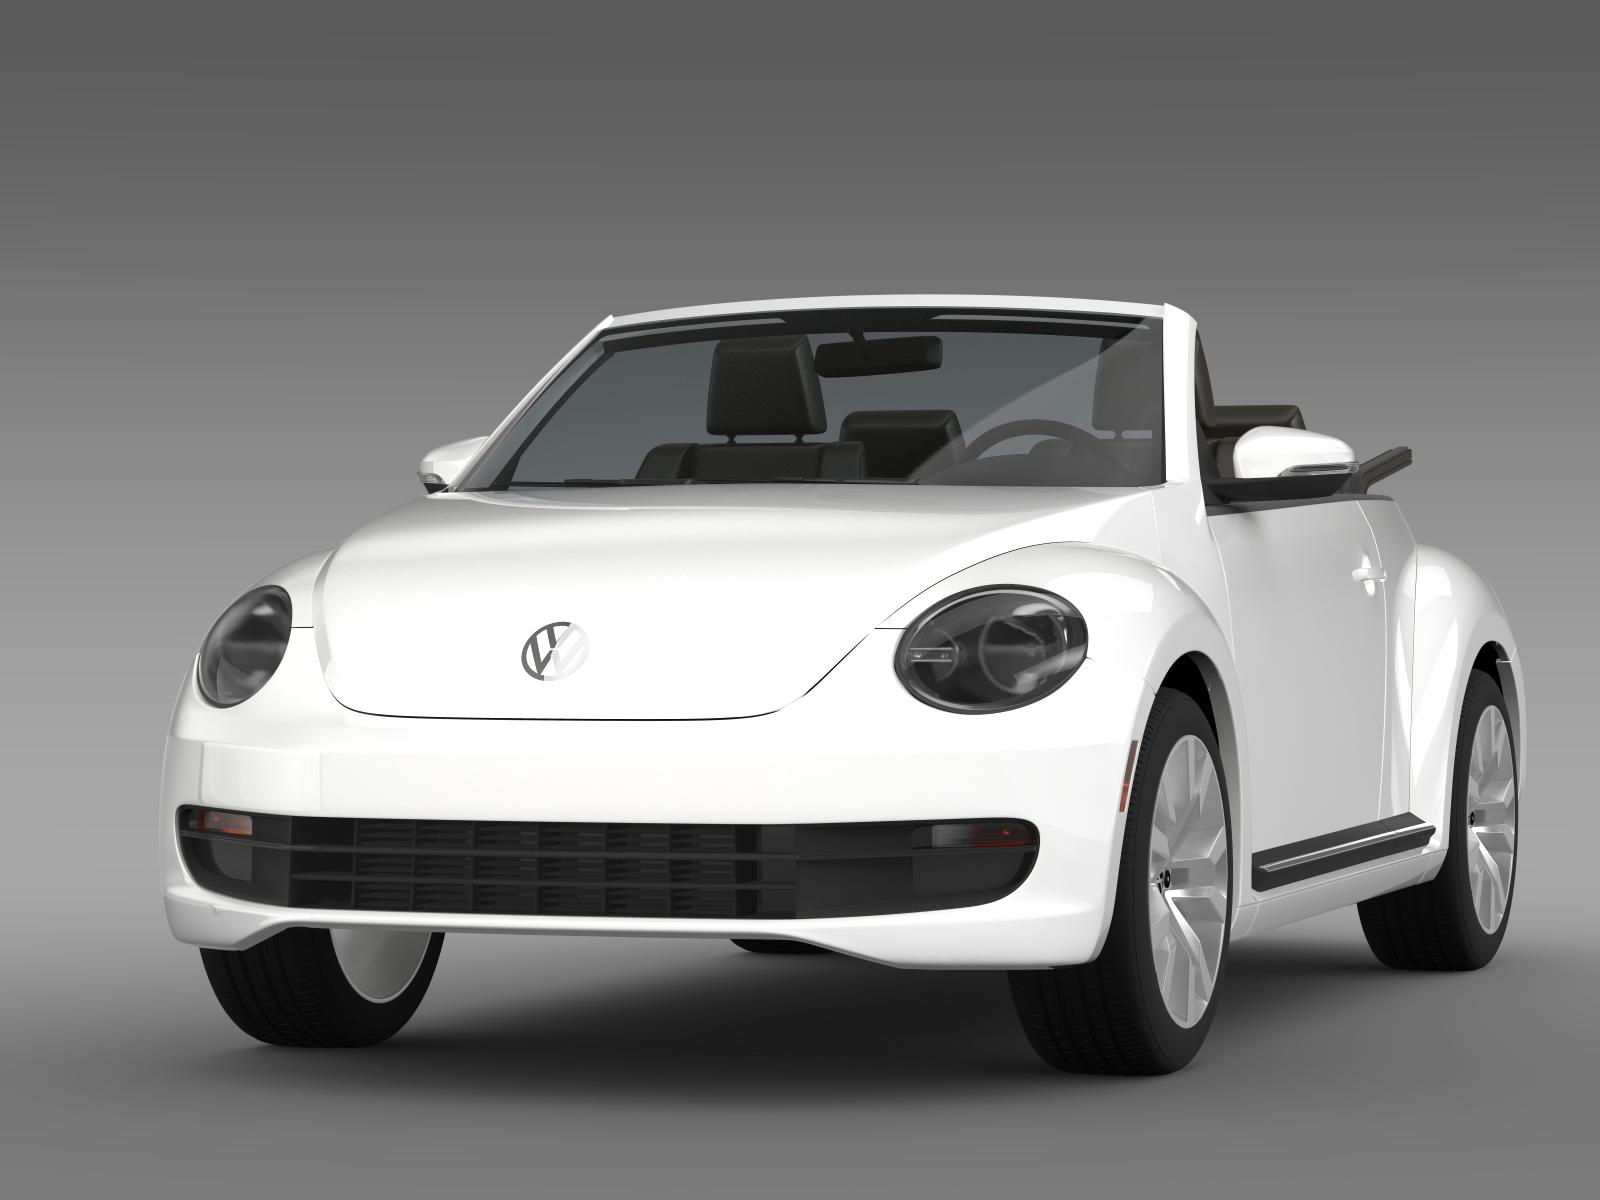 vw beetle tdi cabrio 2014 3d model buy vw beetle tdi. Black Bedroom Furniture Sets. Home Design Ideas